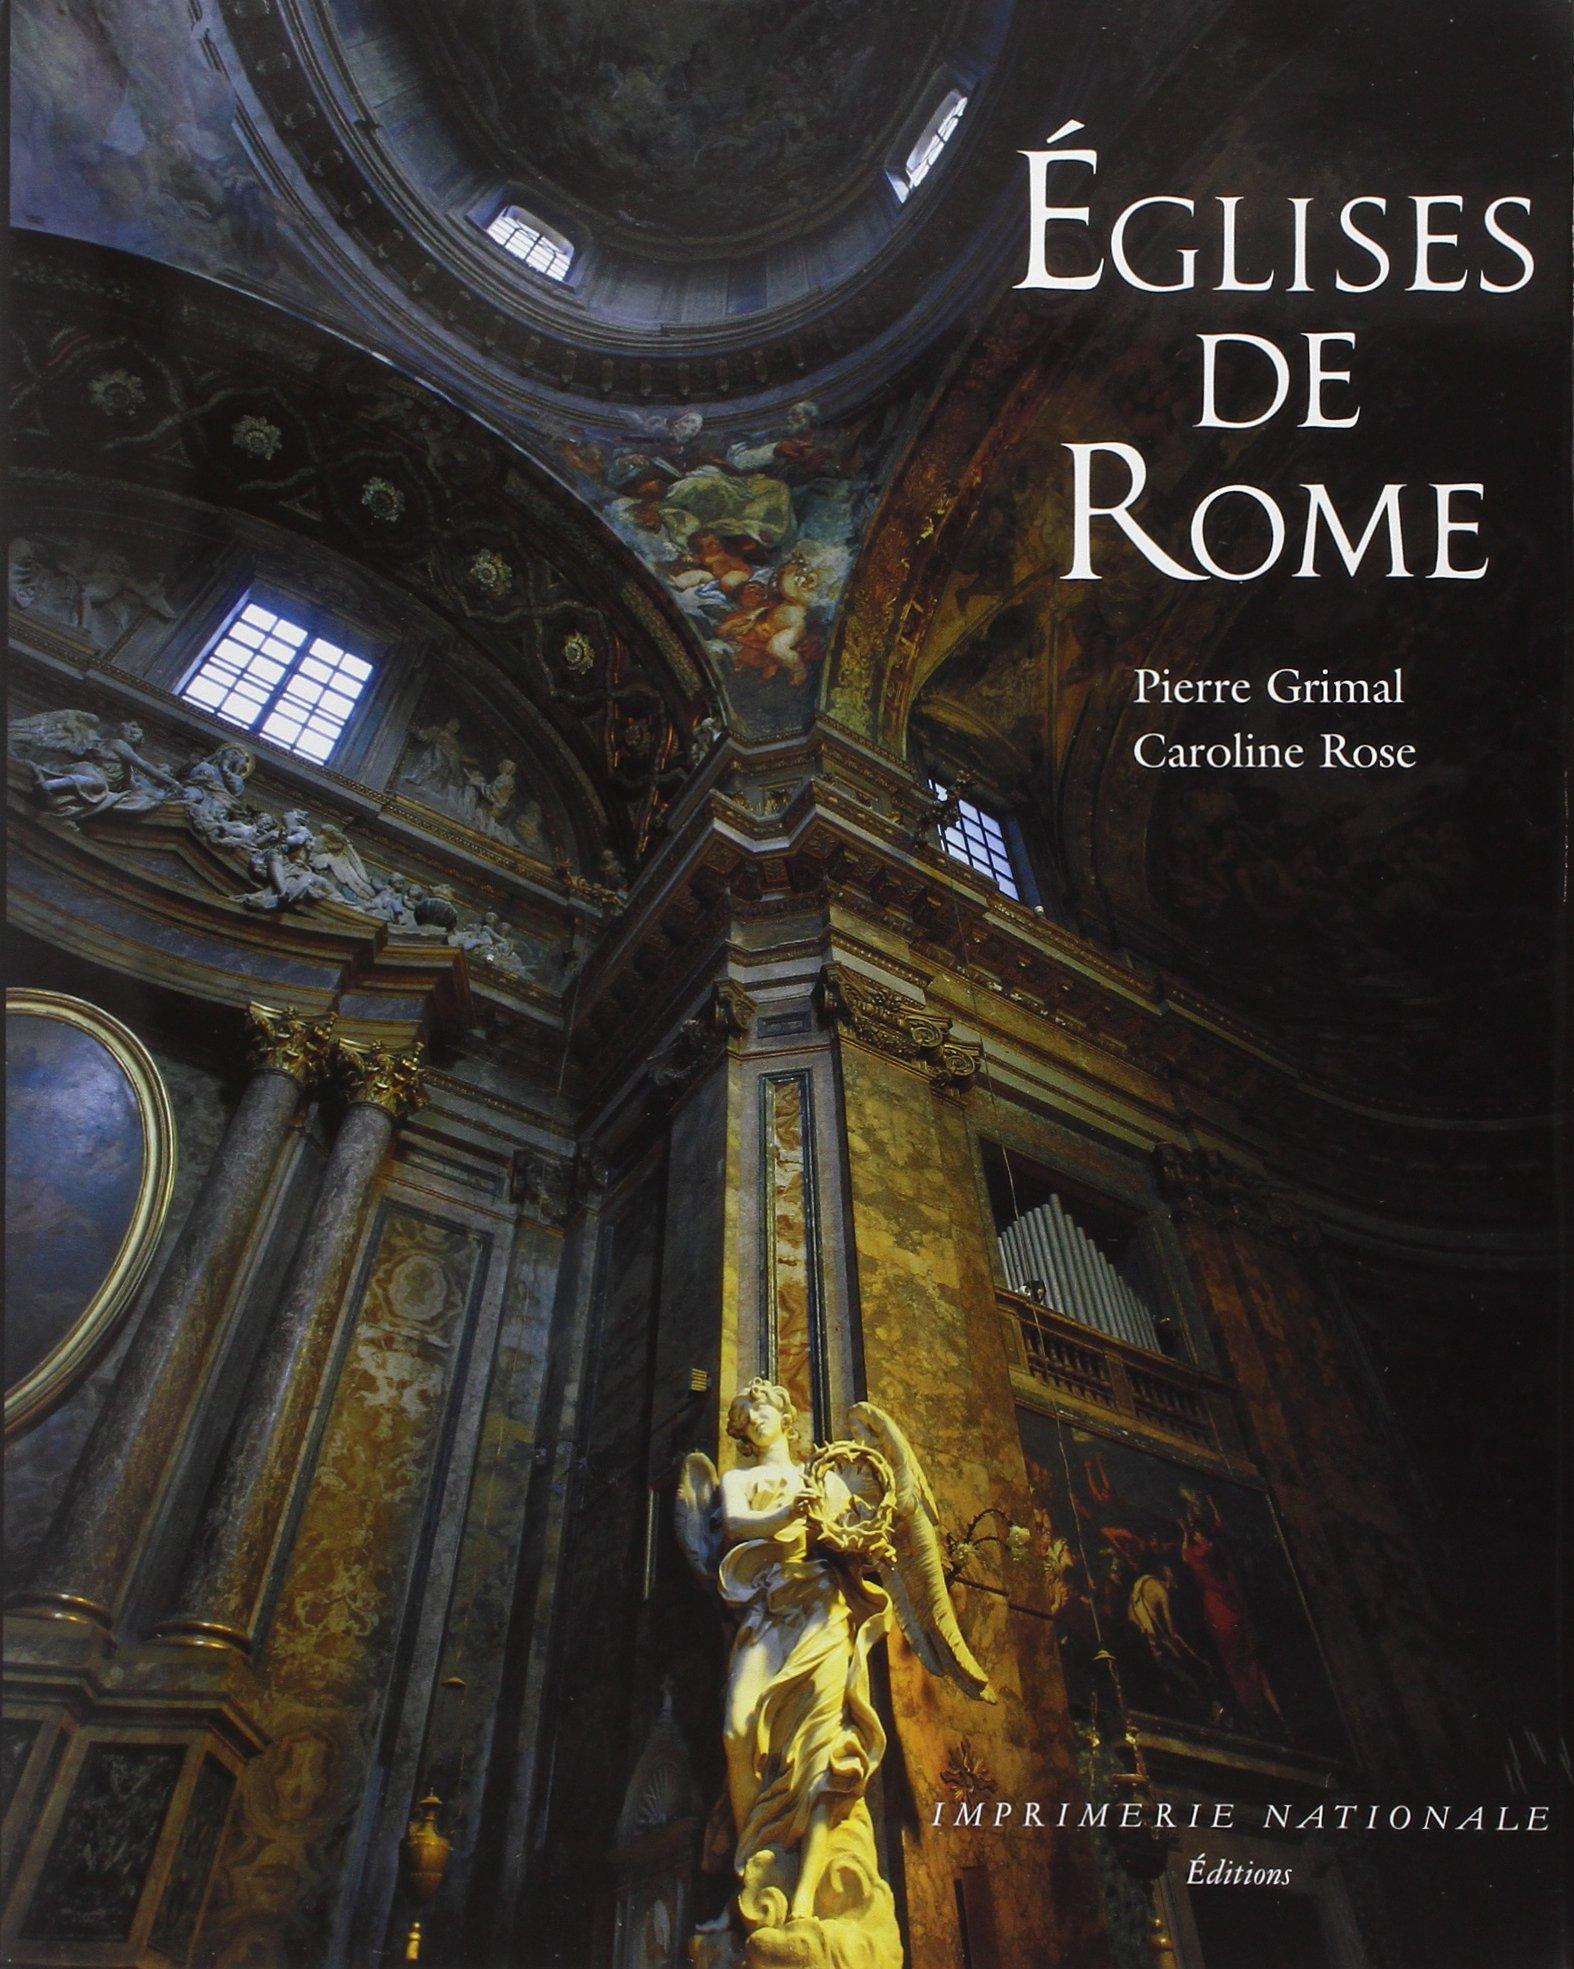 Eglises de Rome por Pierre Grimal